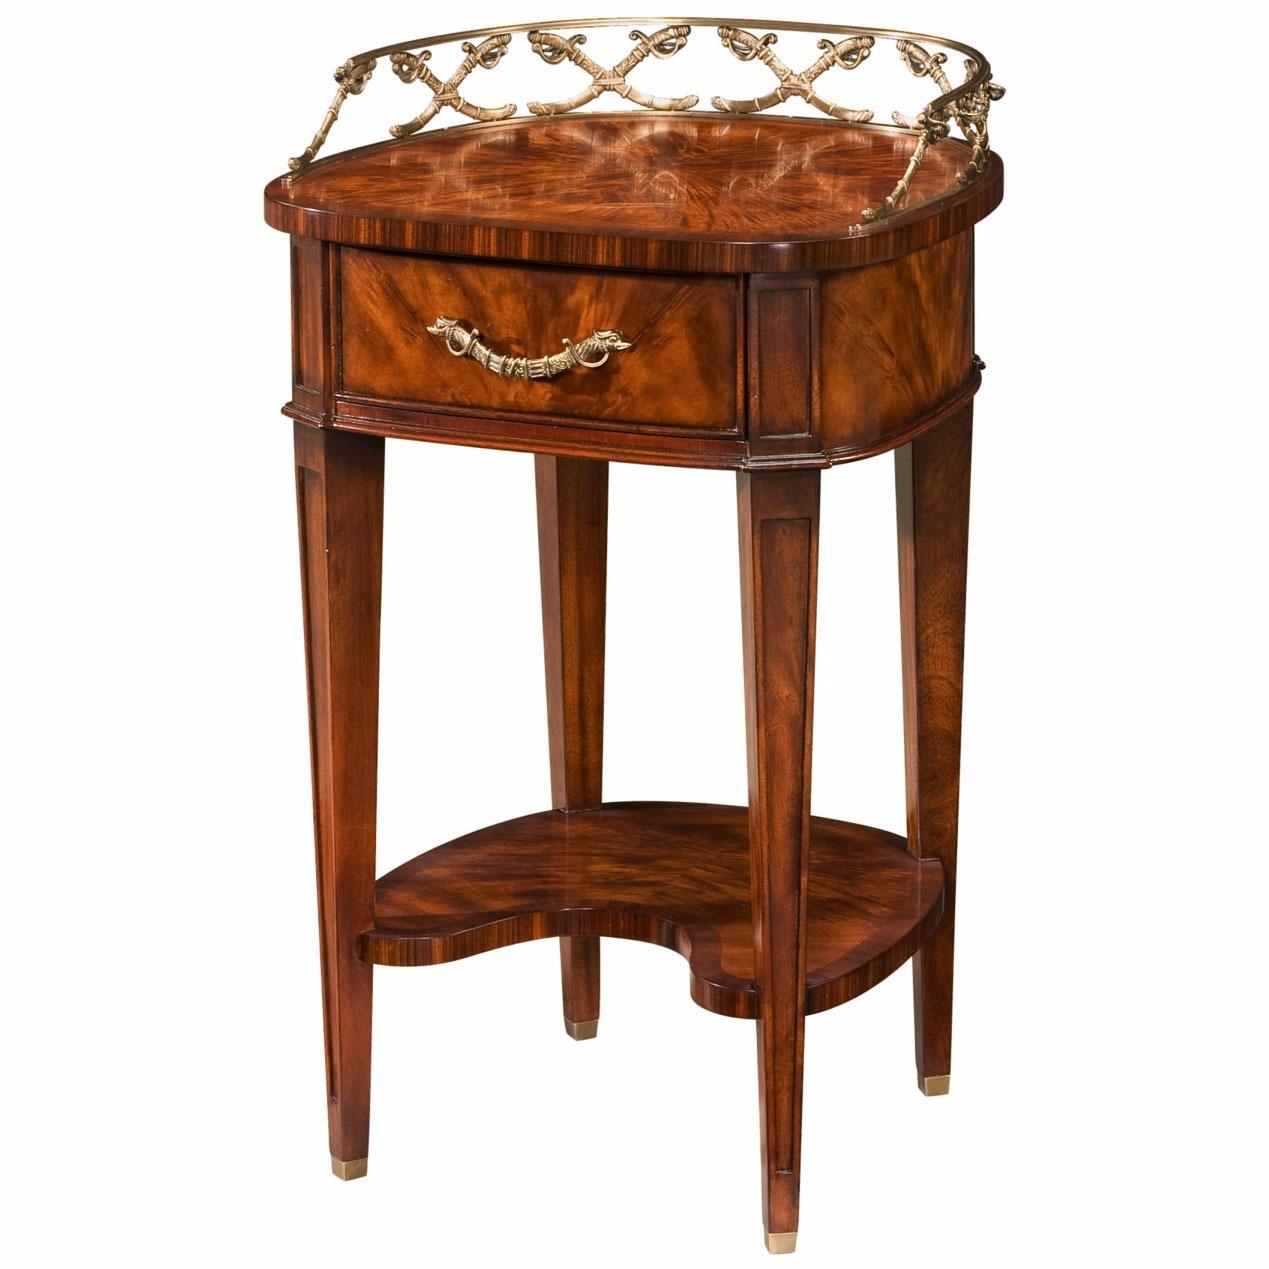 Mahogany lamp table or bedside